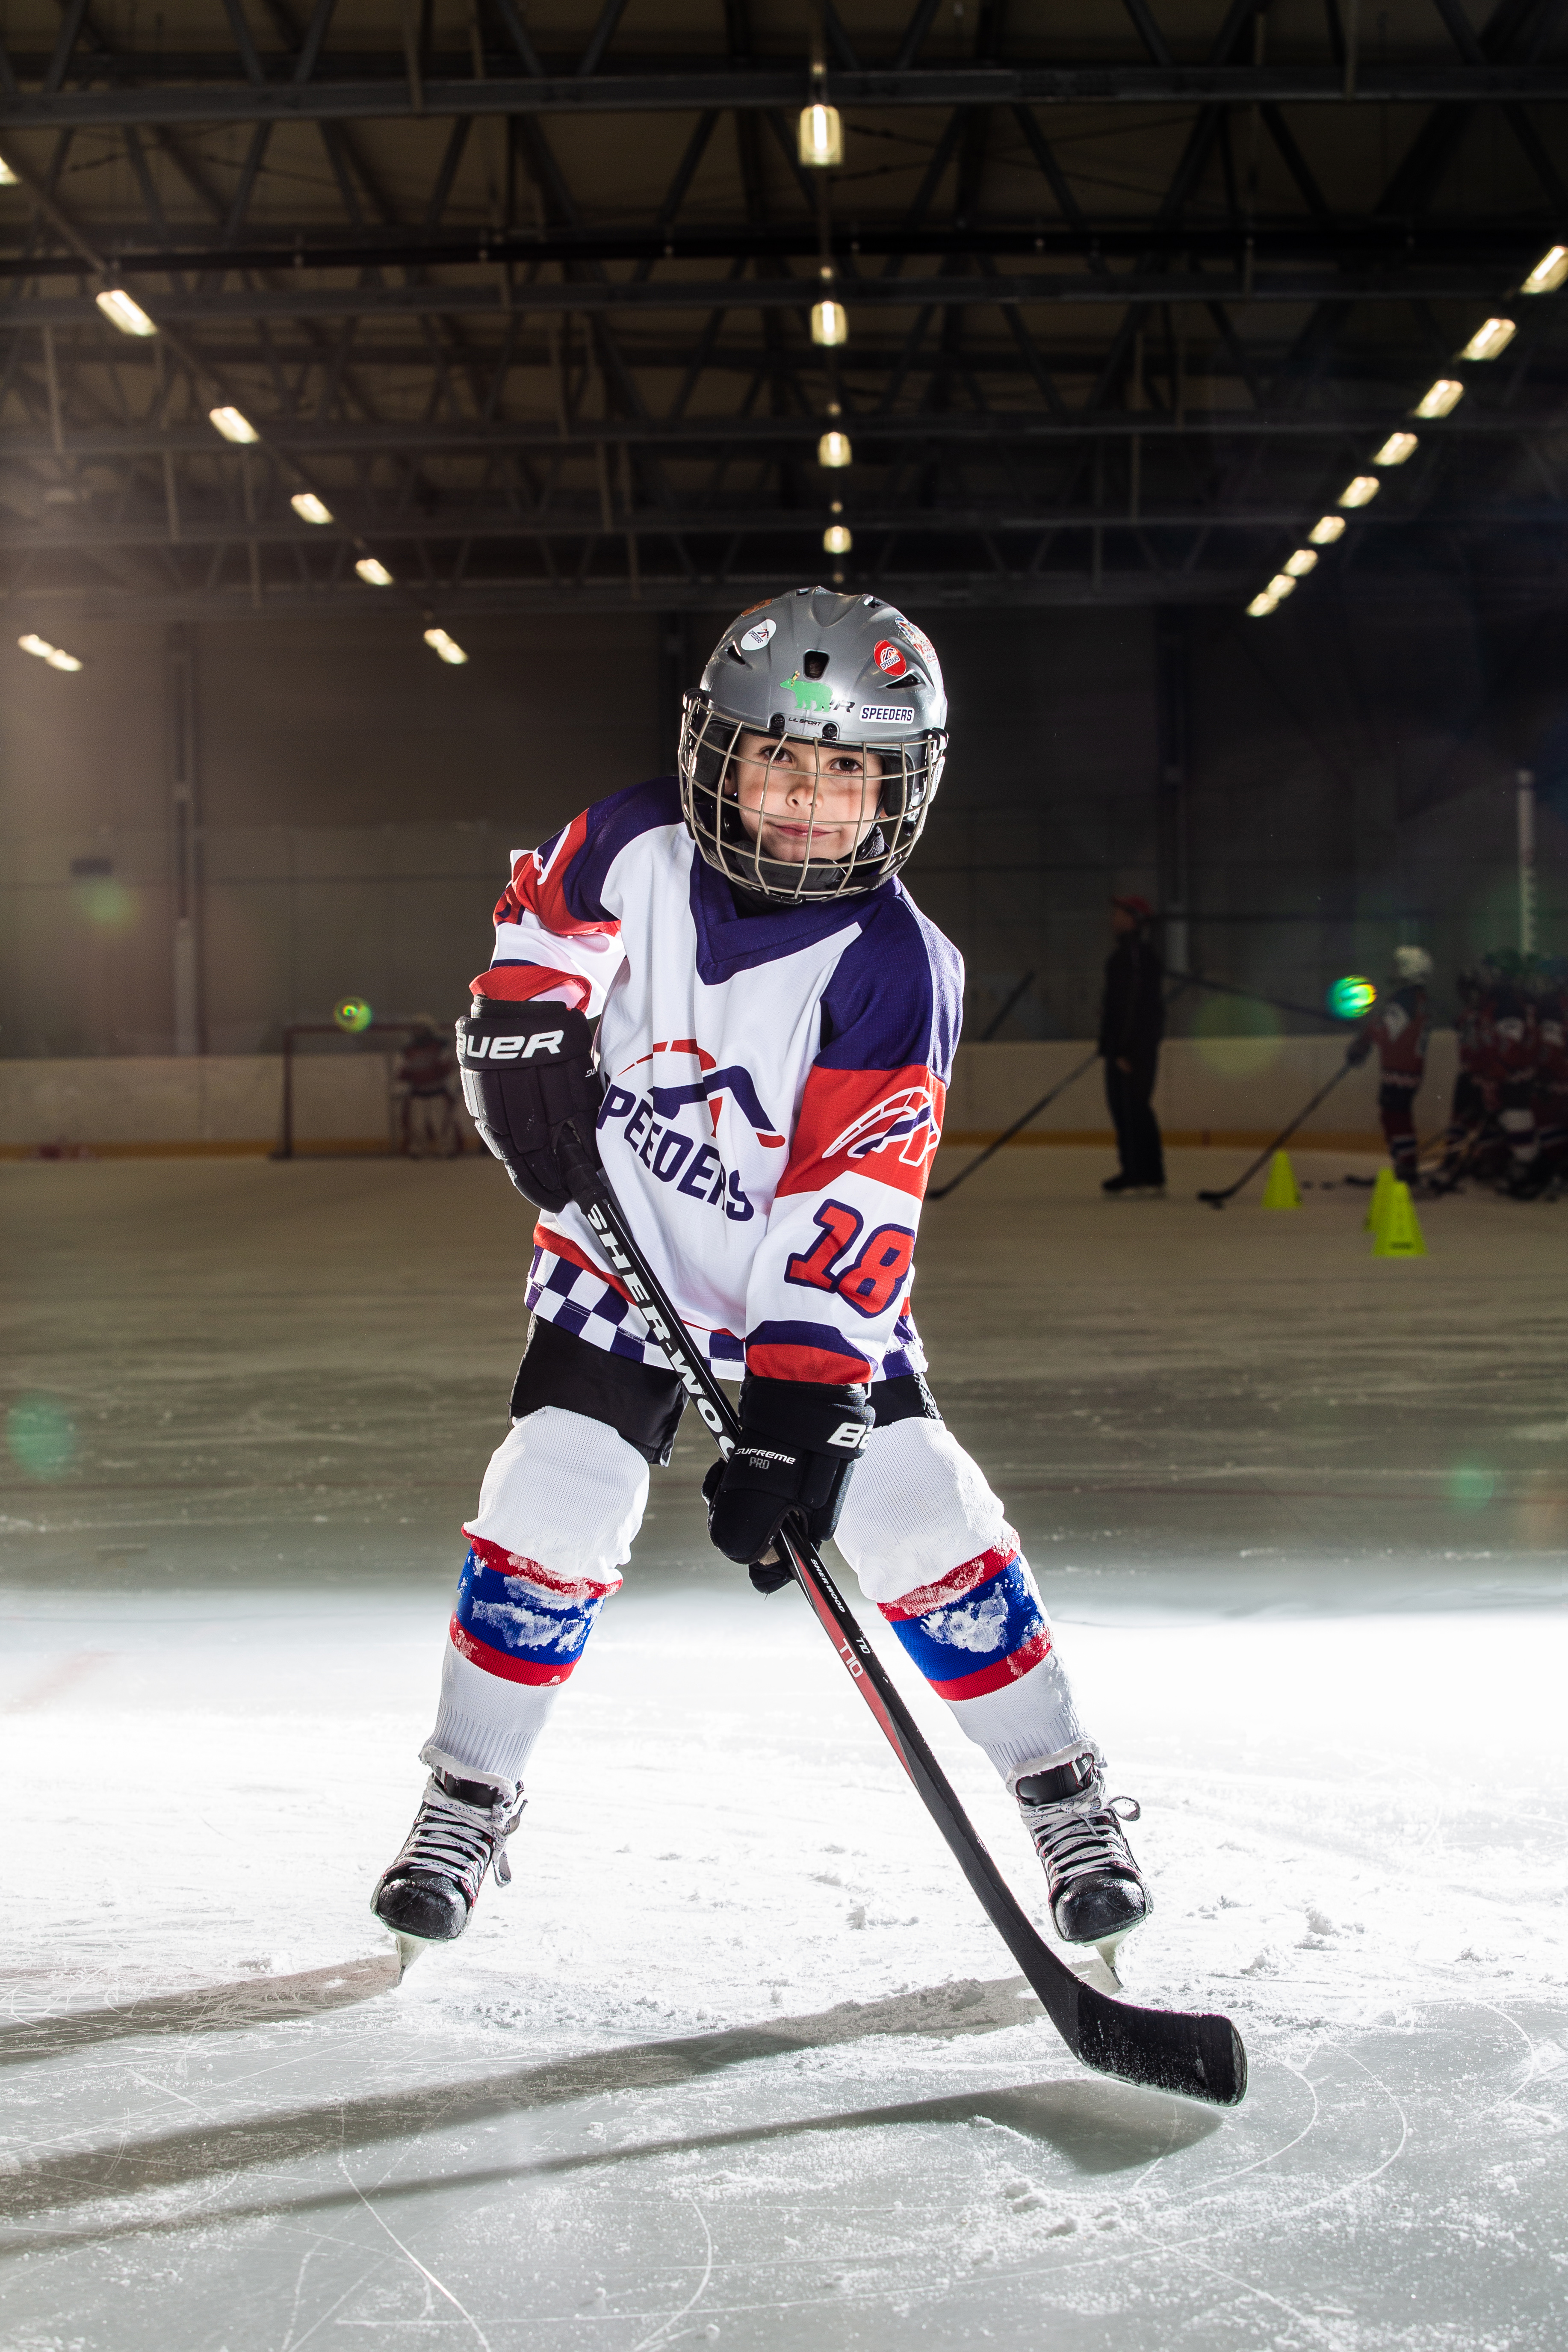 Peter Hodal Speeders Bratislava cislo 18 hokej